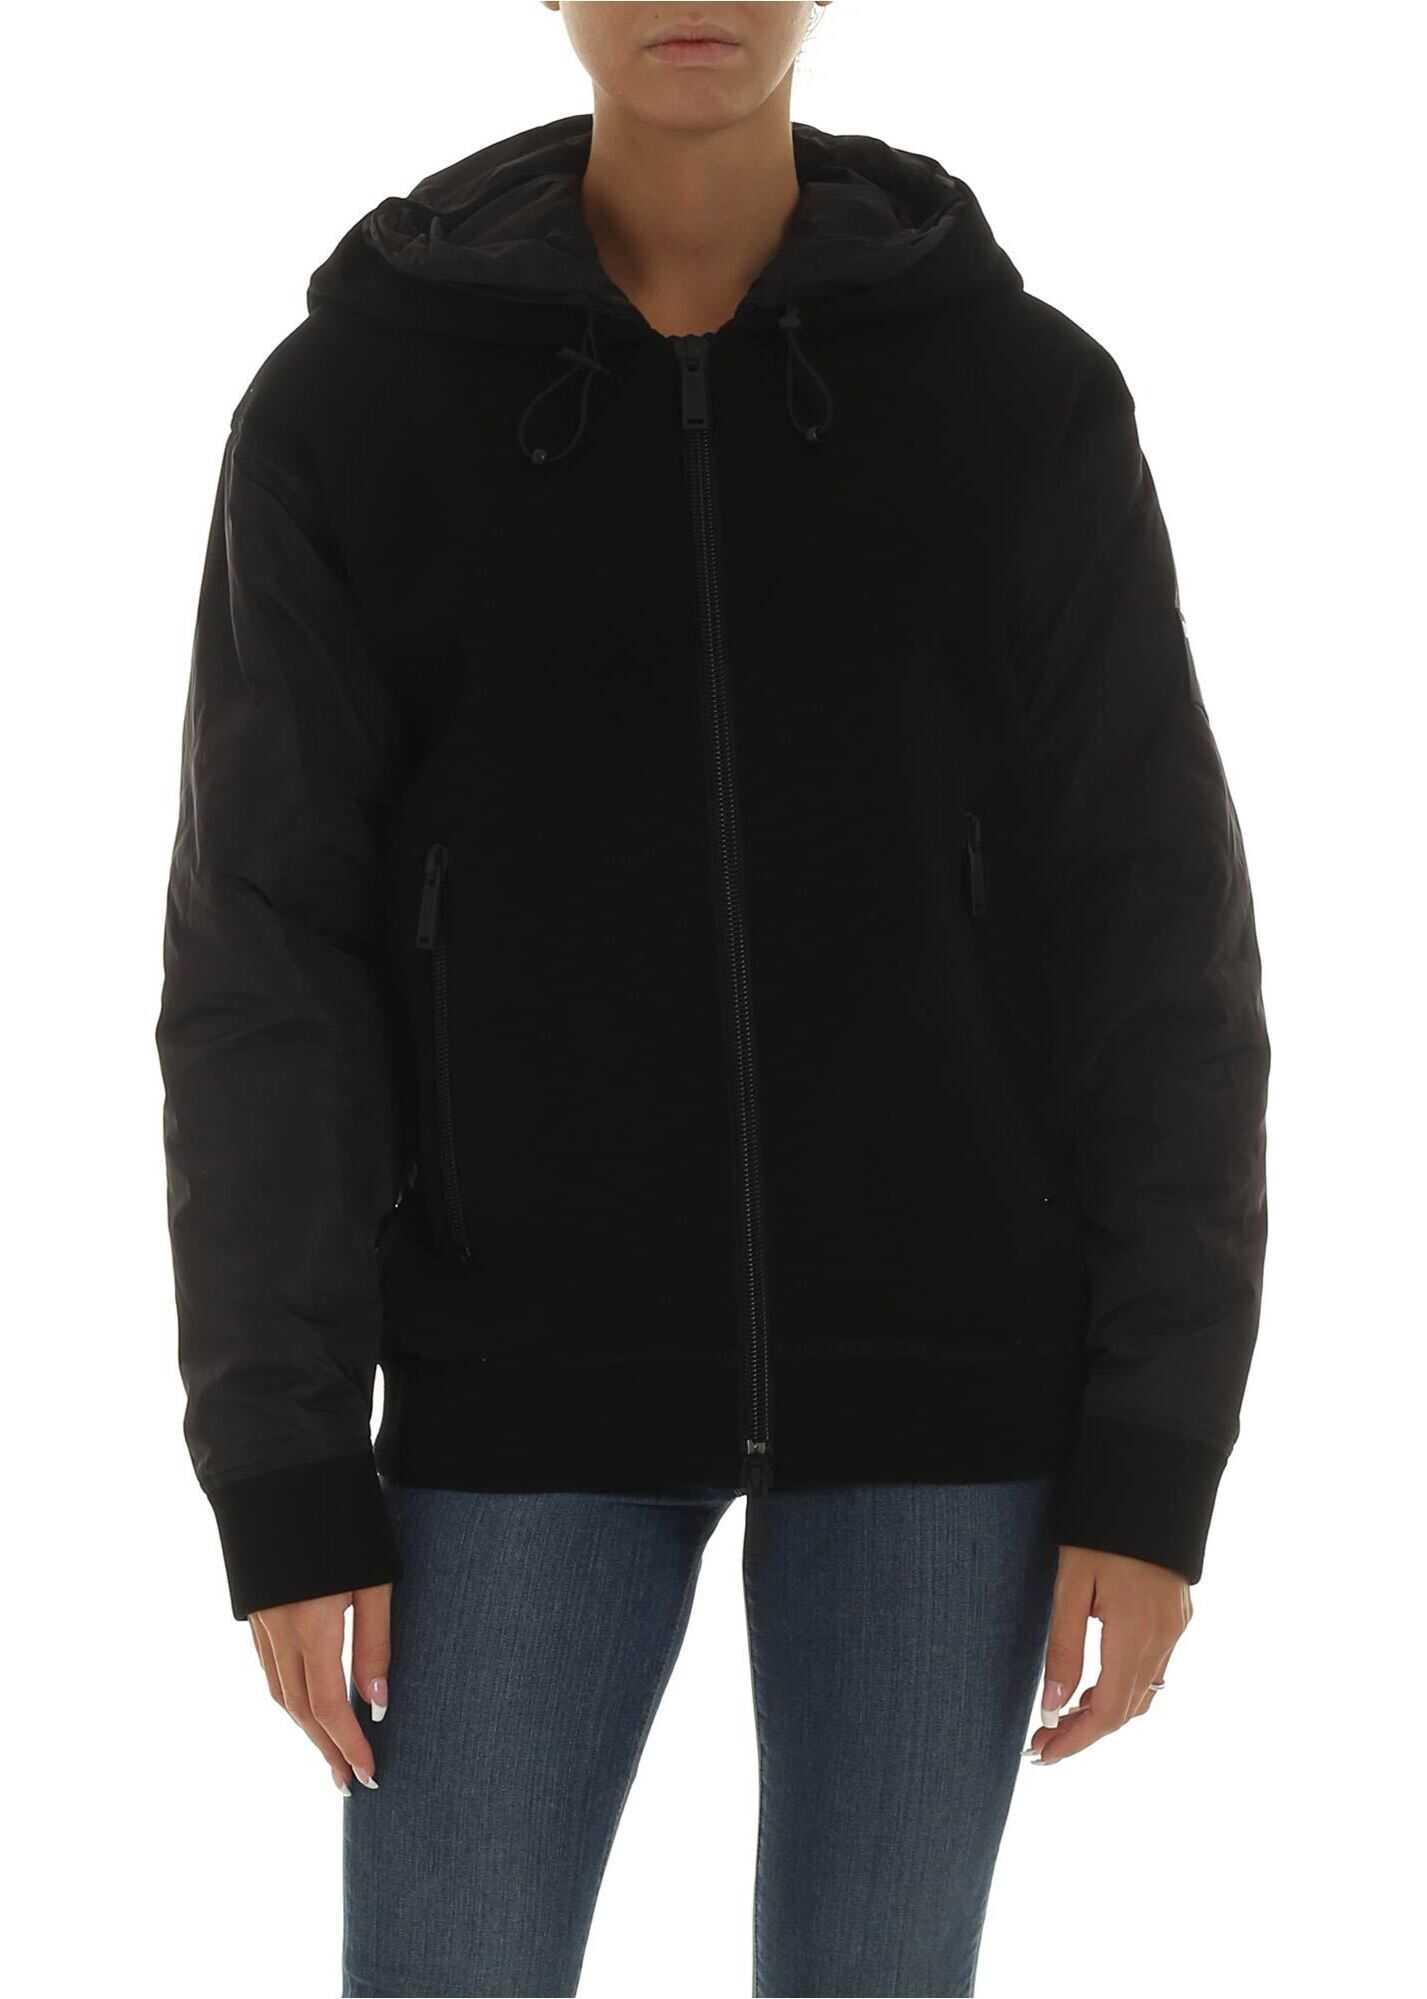 DSQUARED2 Ski Jacket With Hood In Black Black